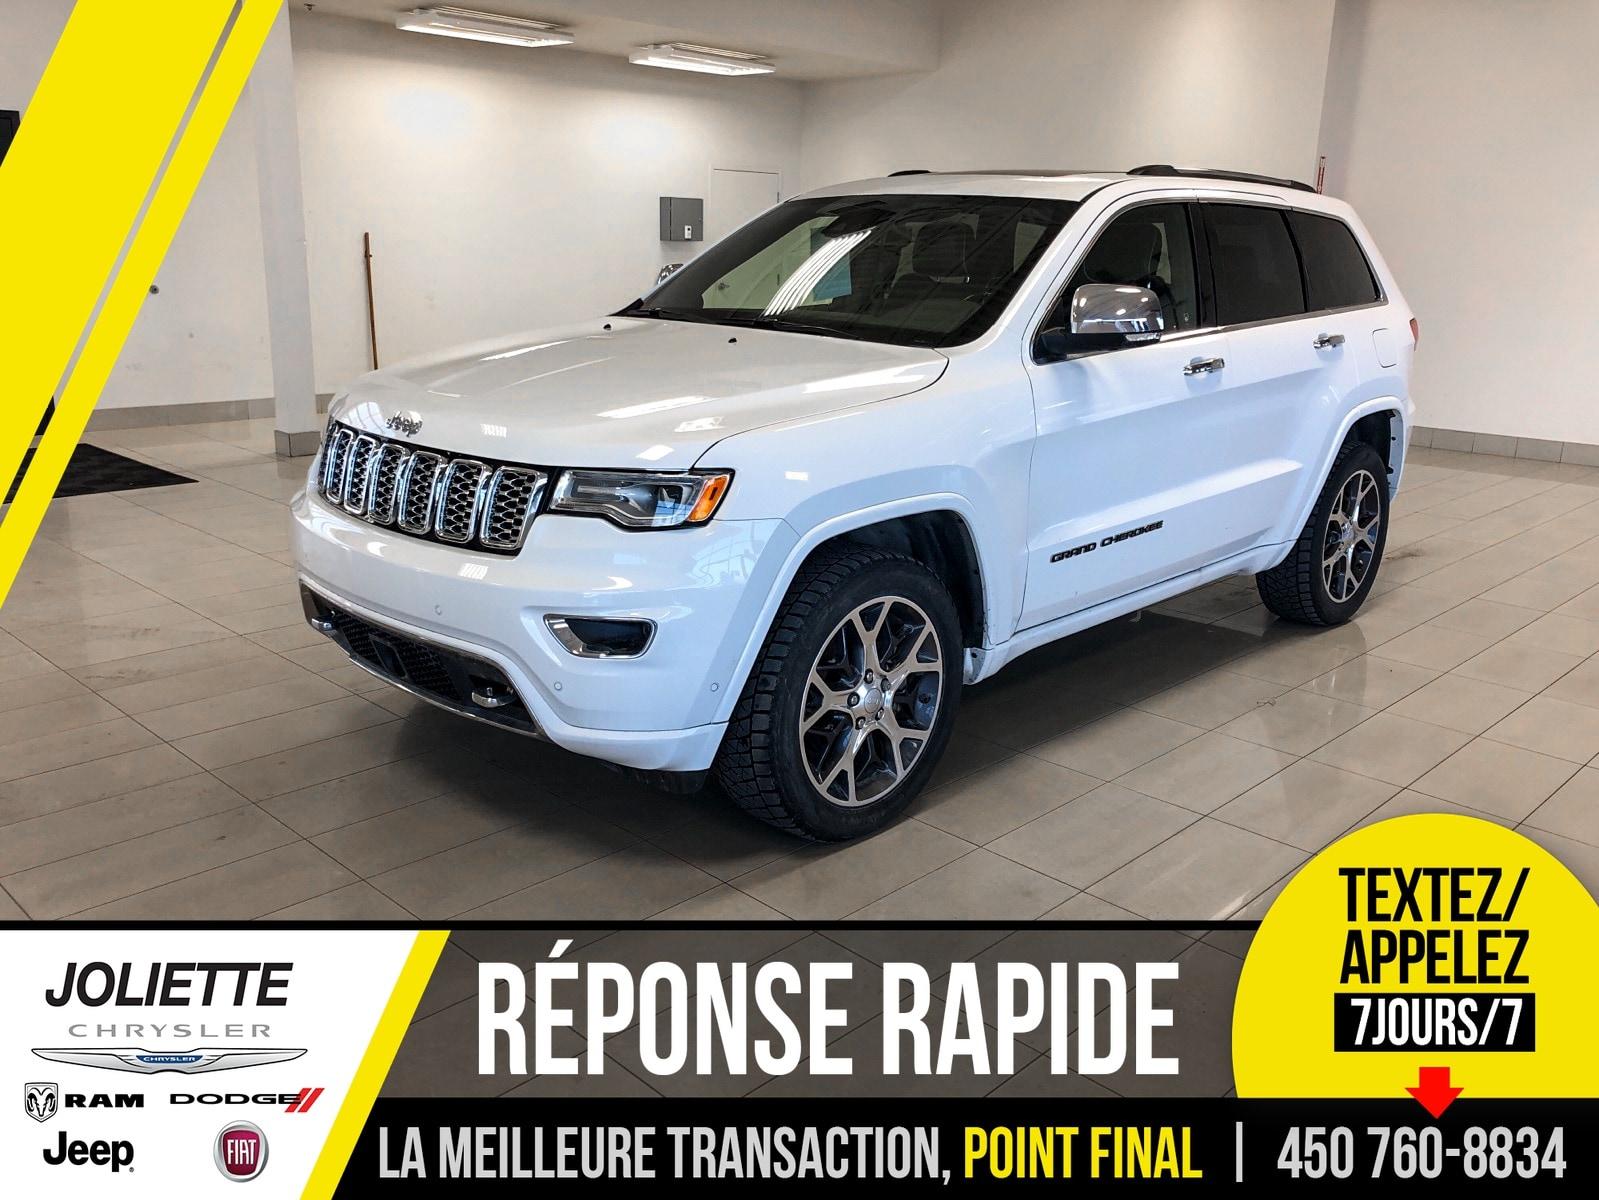 2019 Jeep Grand Cherokee Overland 4x4, V8, CUIR, TOIT, NAVIGATION!!